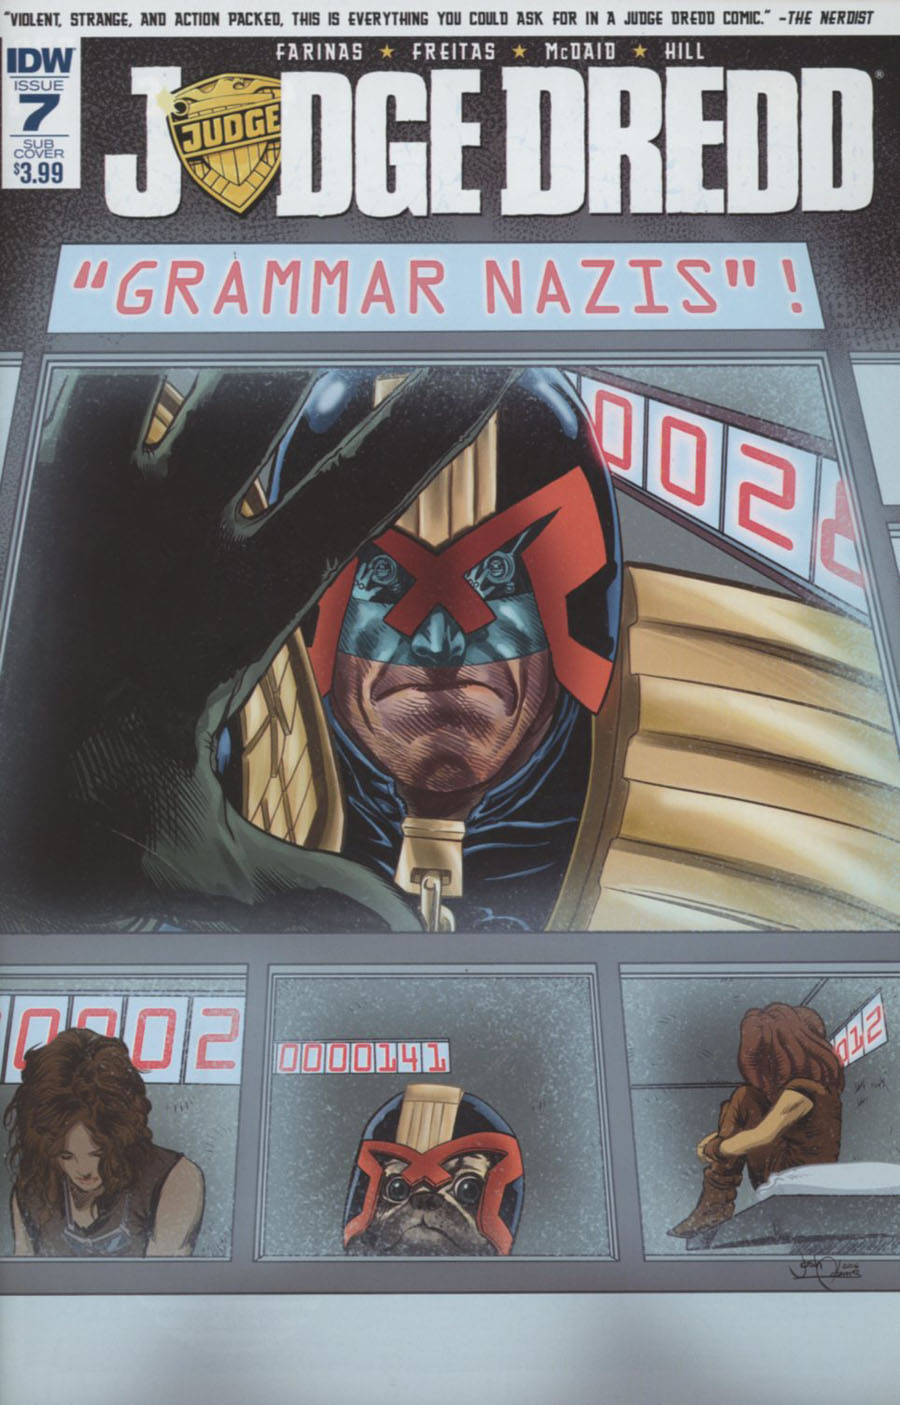 Judge Dredd Vol 5 #7 Cover B Variant Josh Adams Subscription Cover